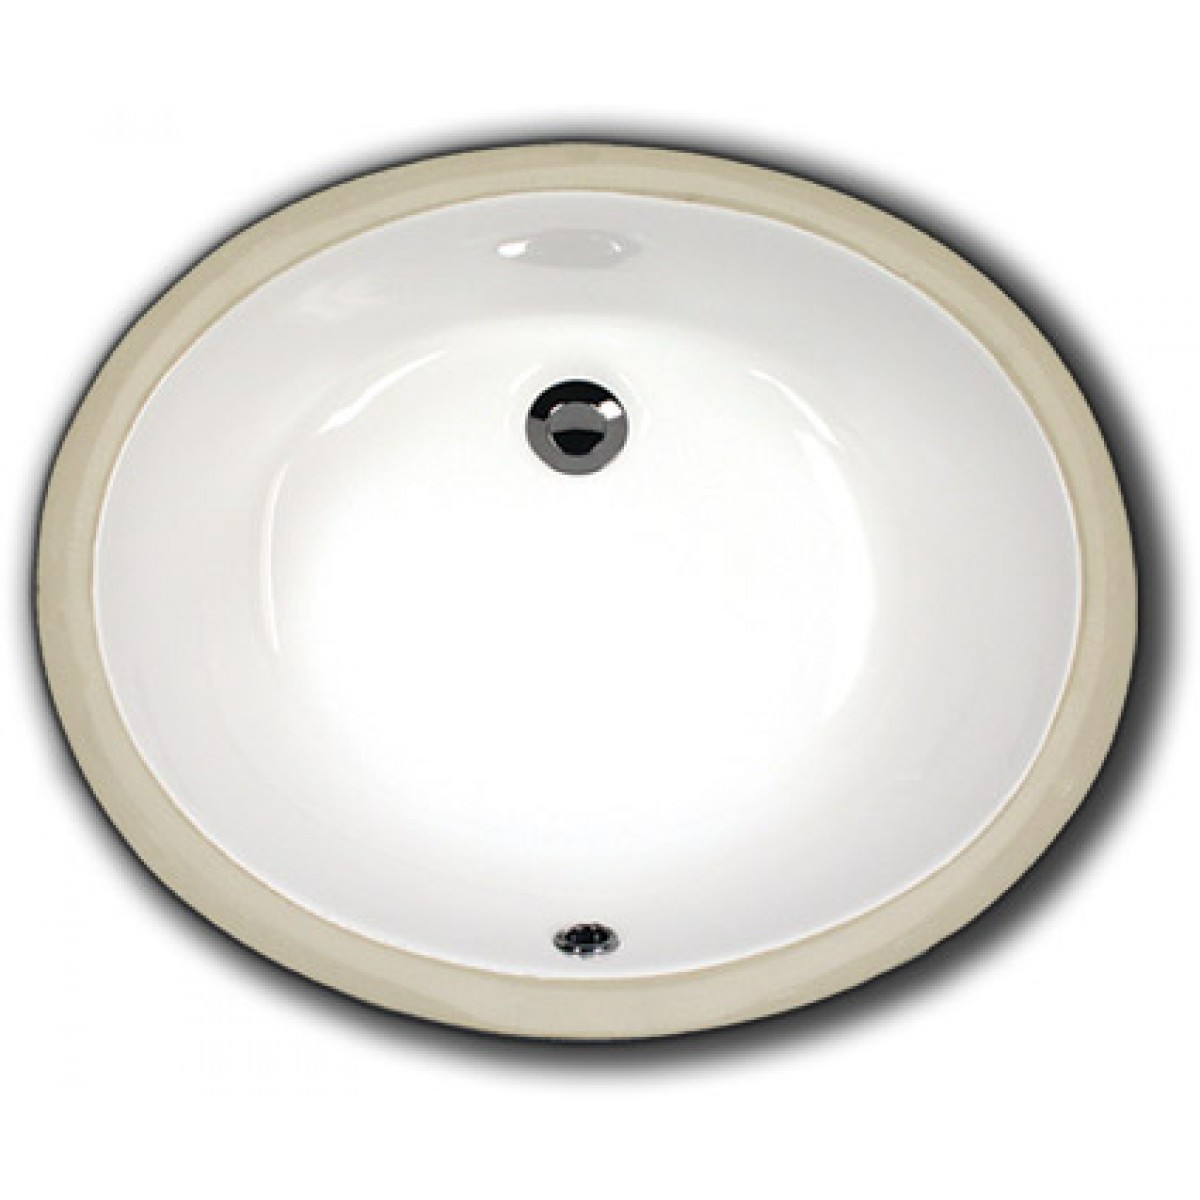 Biscuit Porcelain Ceramic Vanity Undermount Bathroom Vessel Sink   19 1/2 X  15 3/4 X 6 Inch